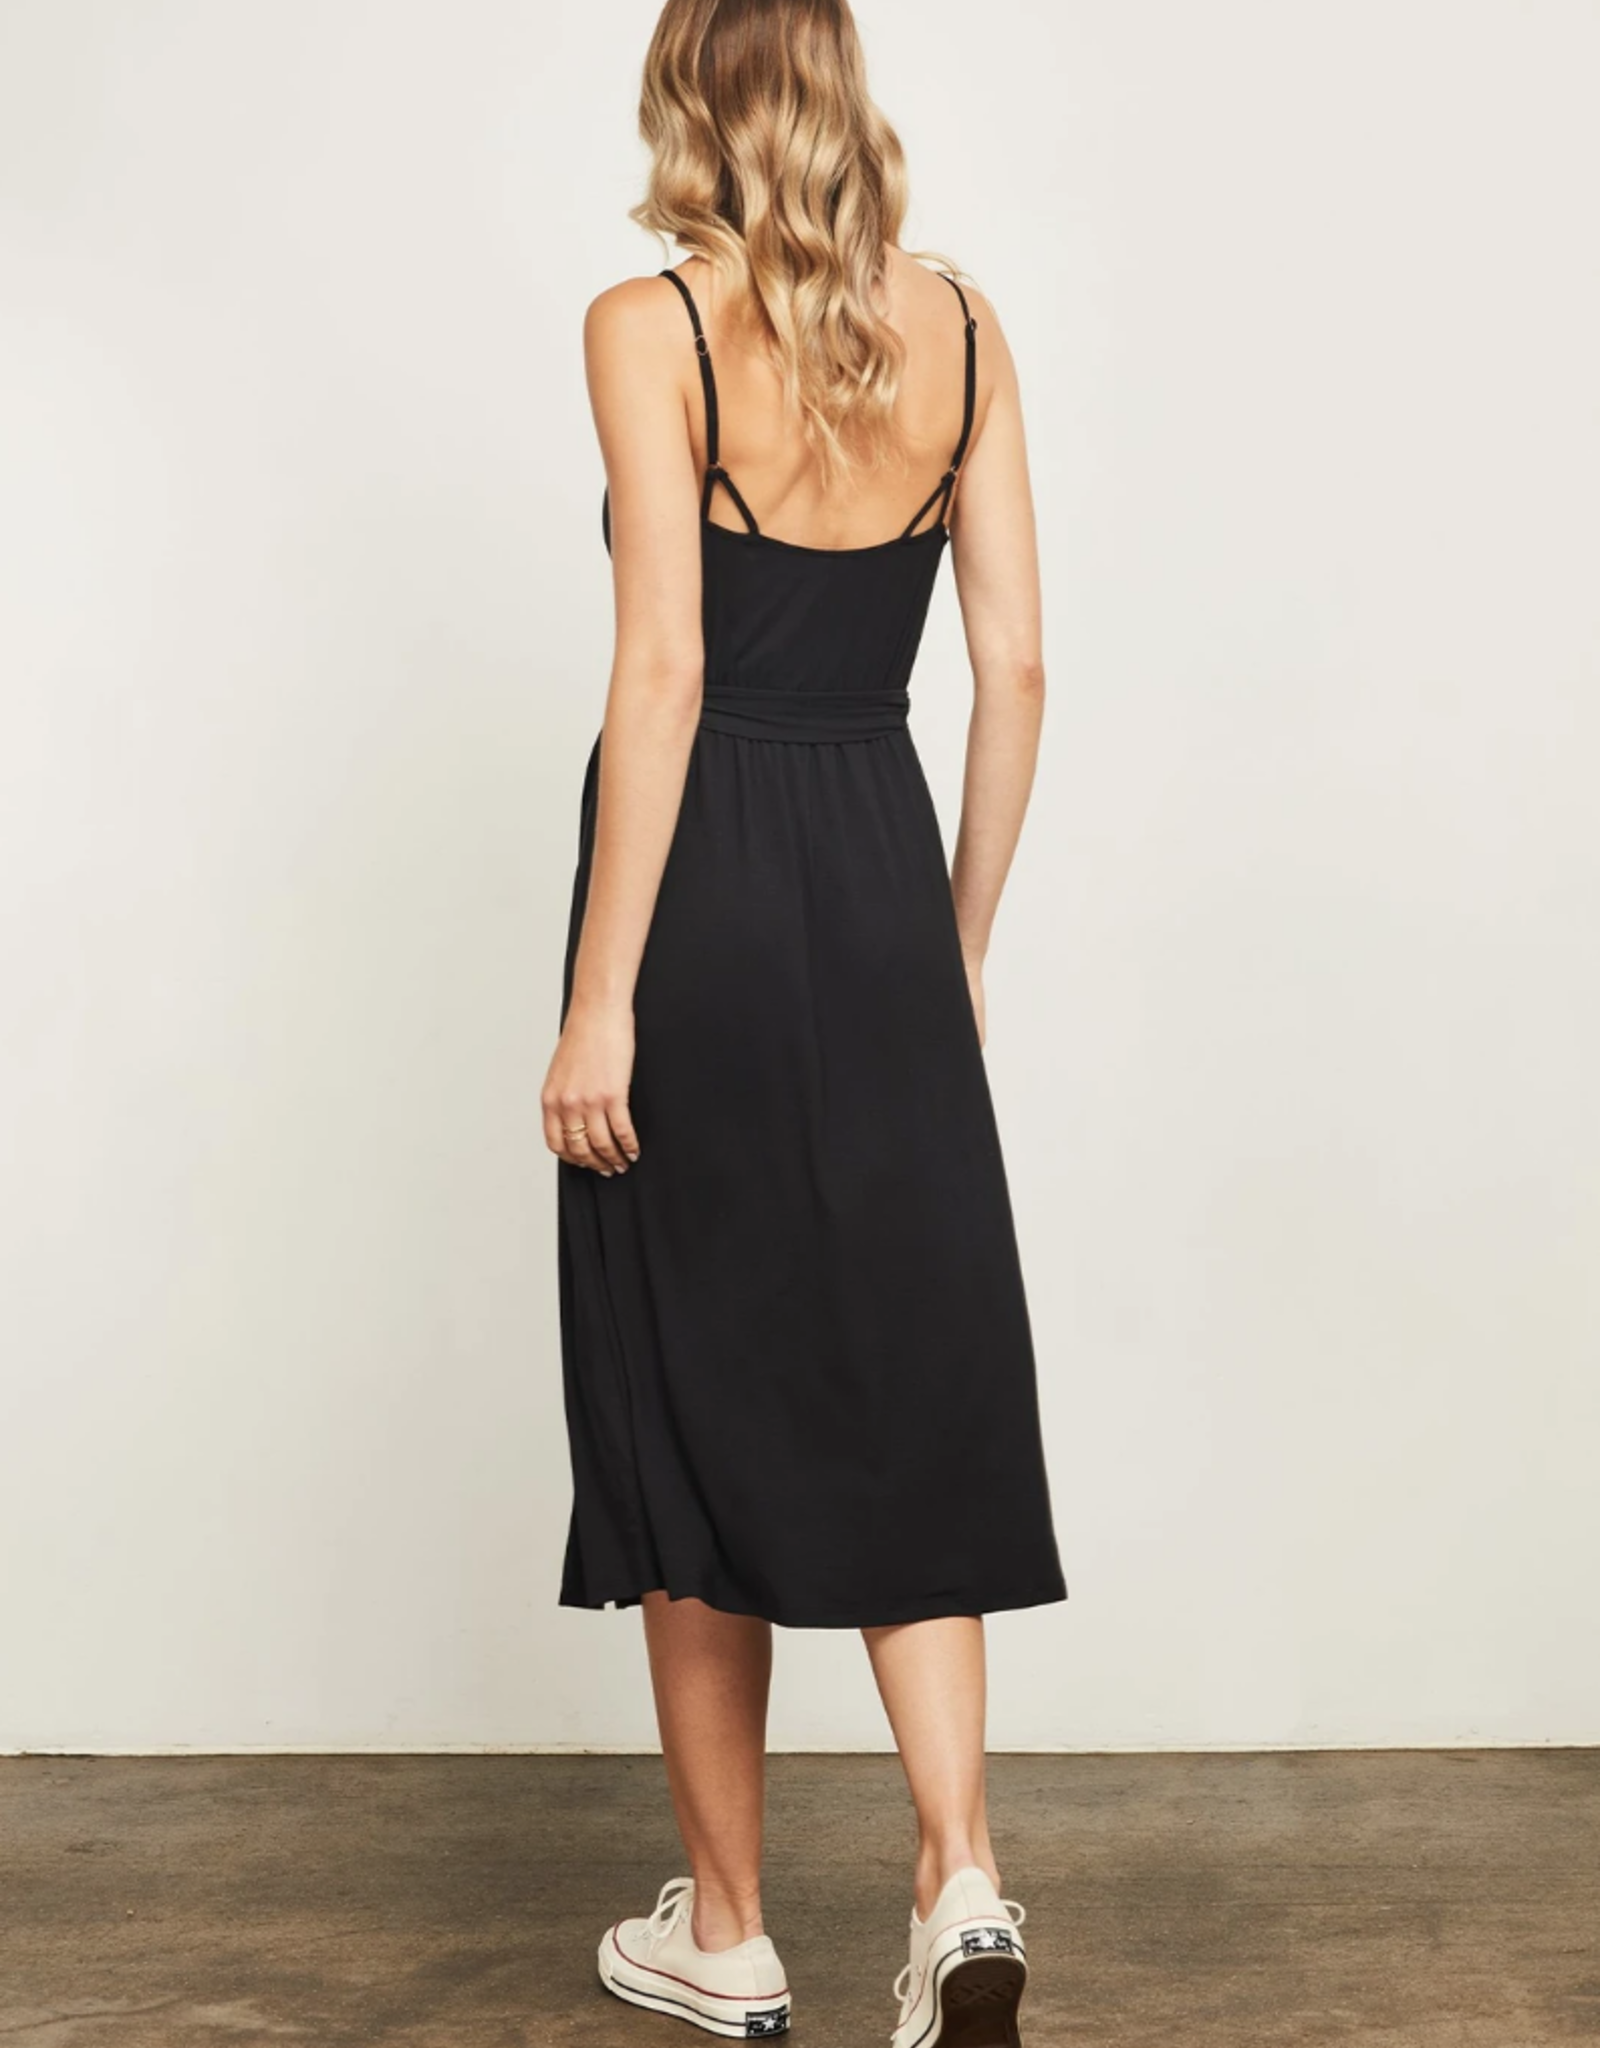 Gentle Fawn Willa Black Dress